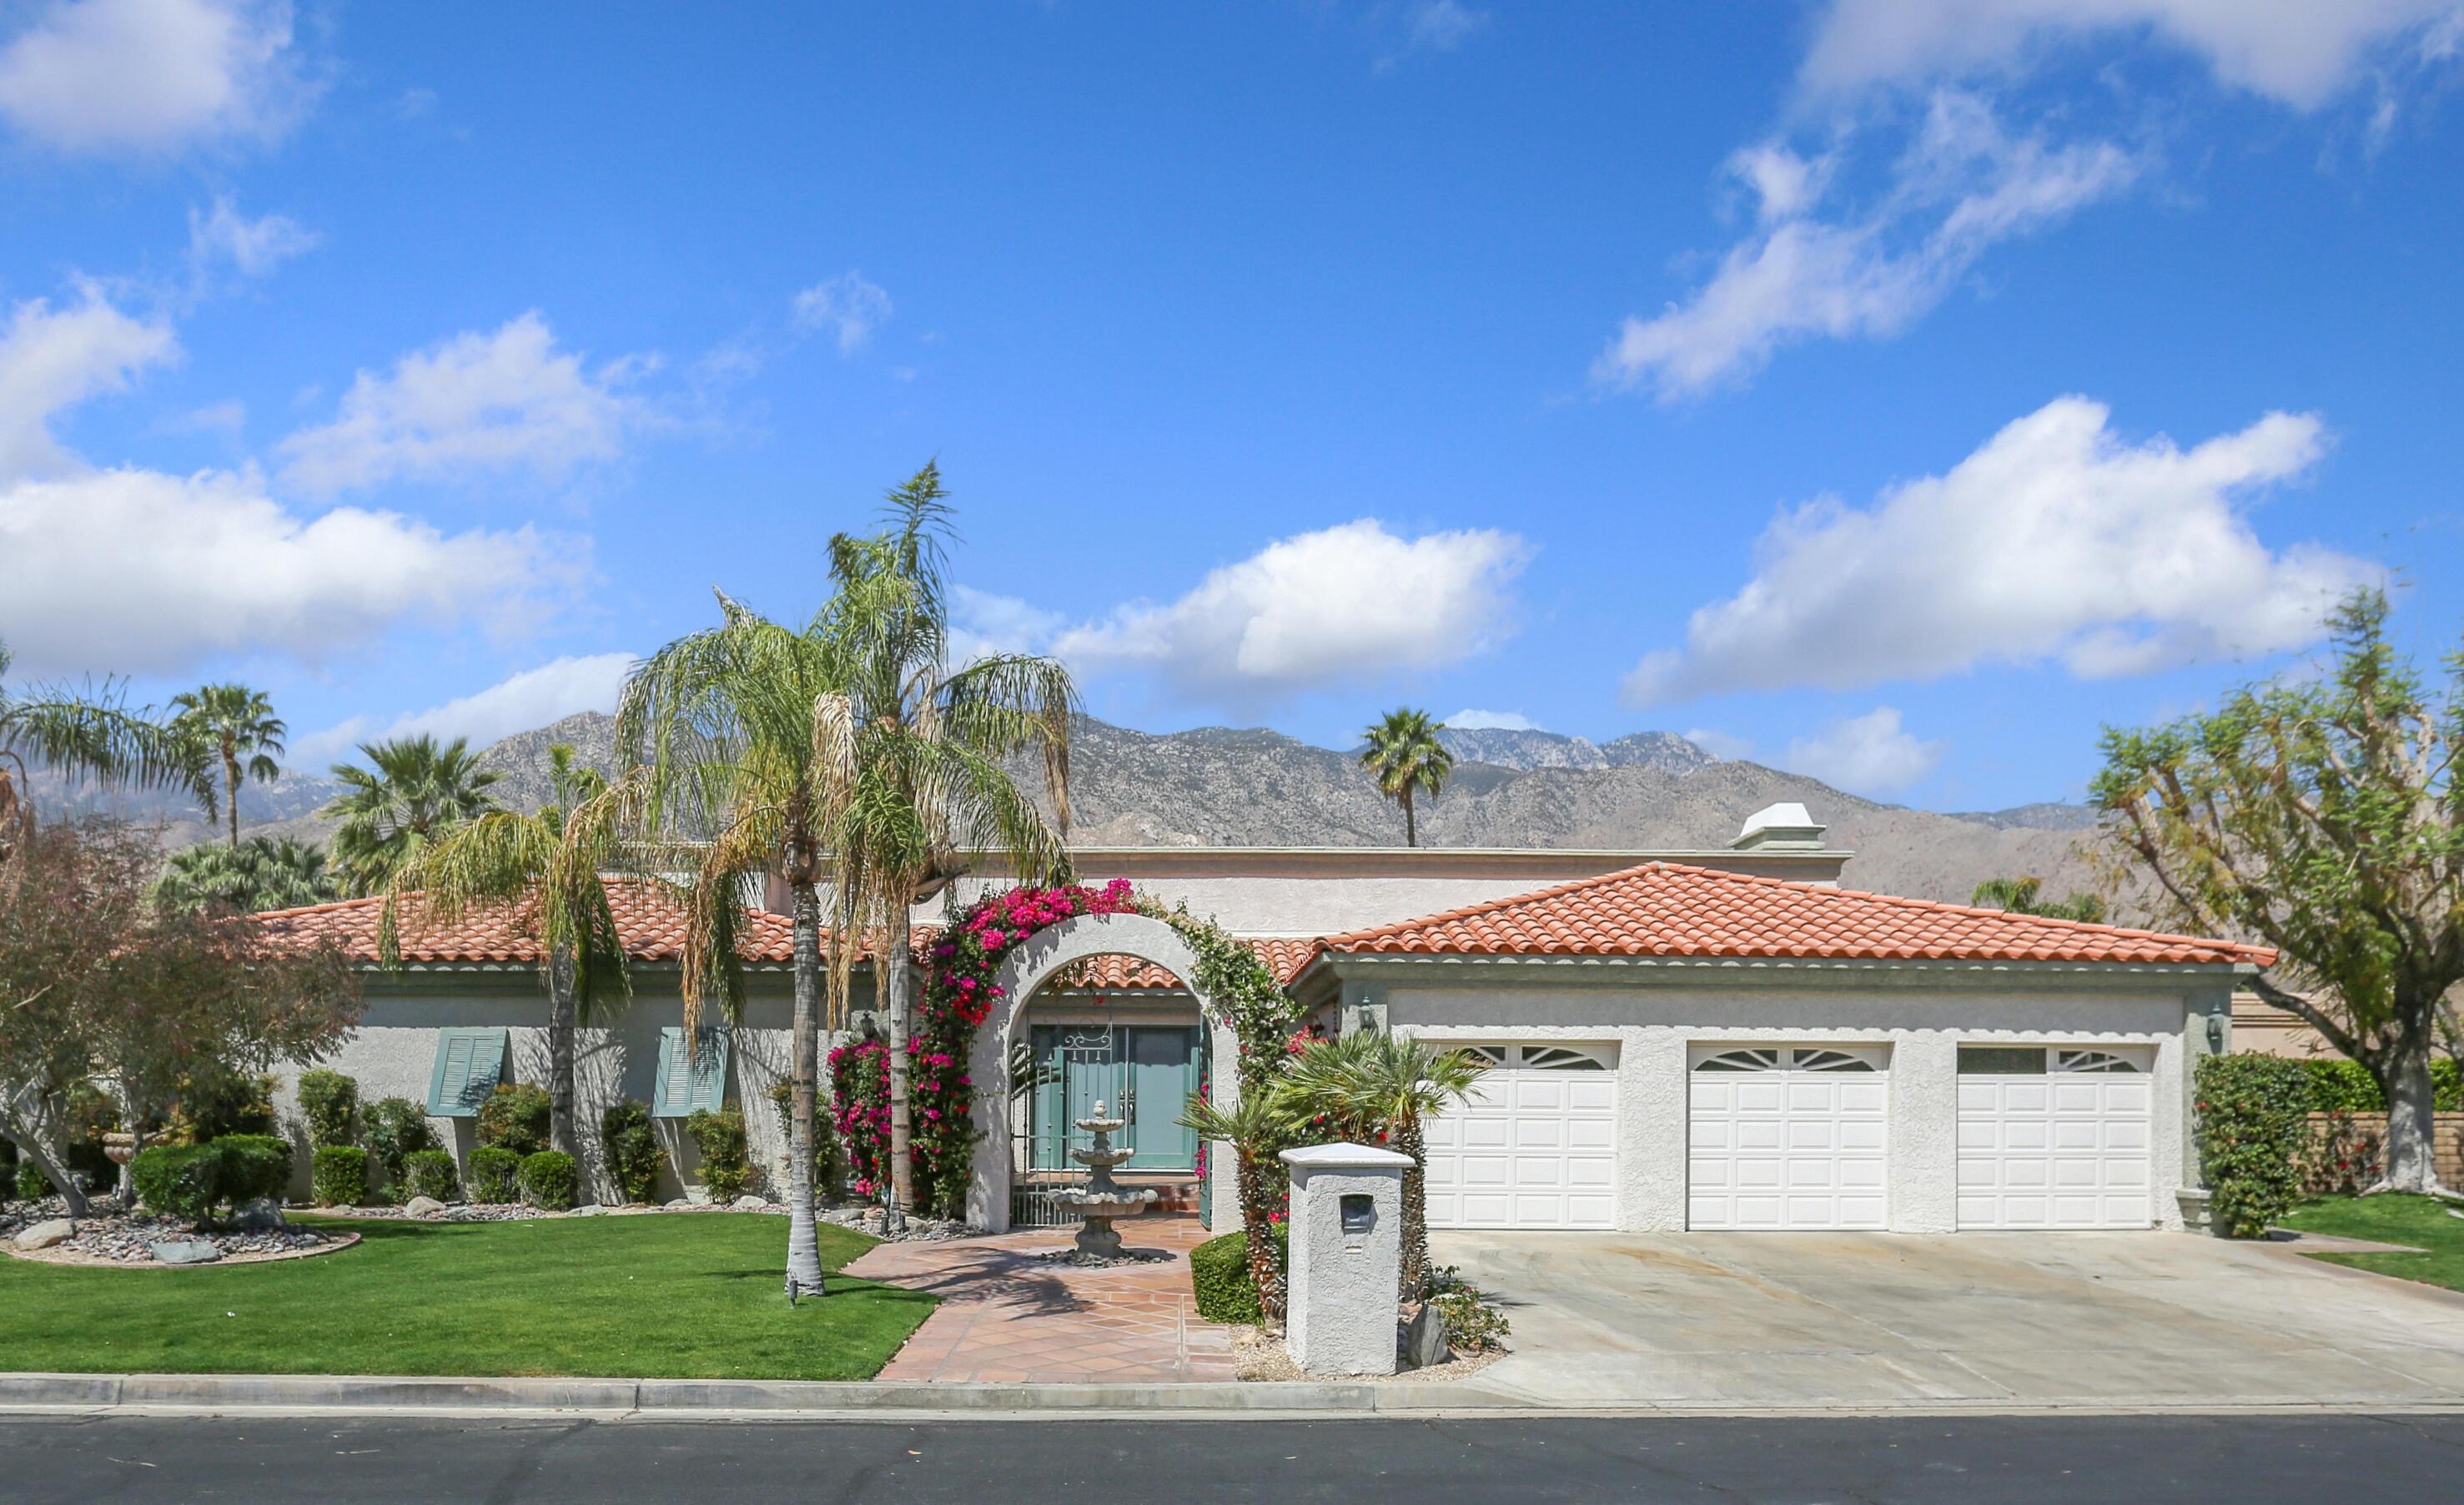 38381 Maracaibo Circle E, Palm Springs, CA 92264